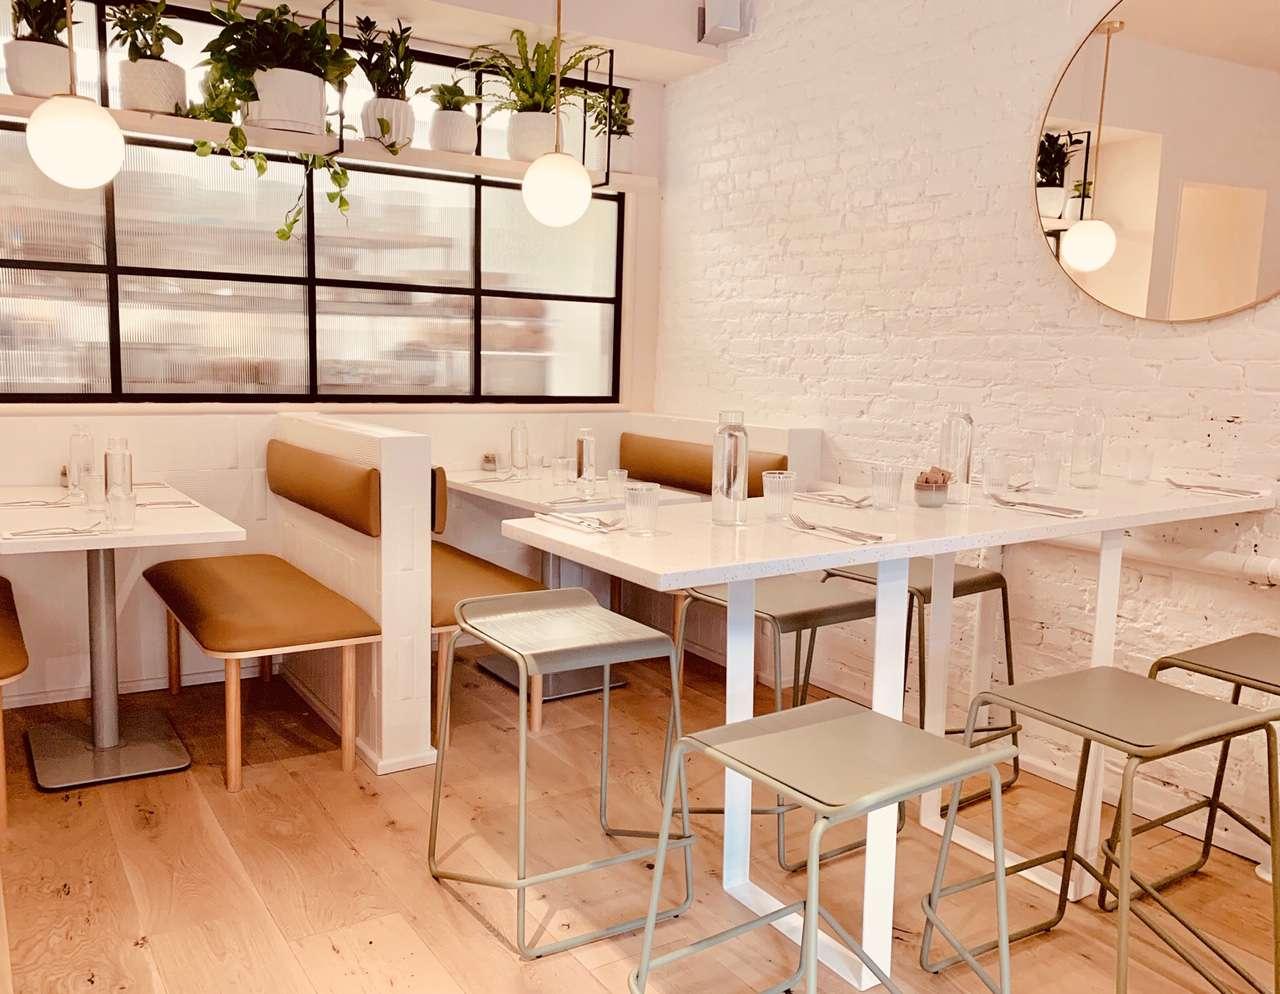 Light-colored interior of Banter restaurant